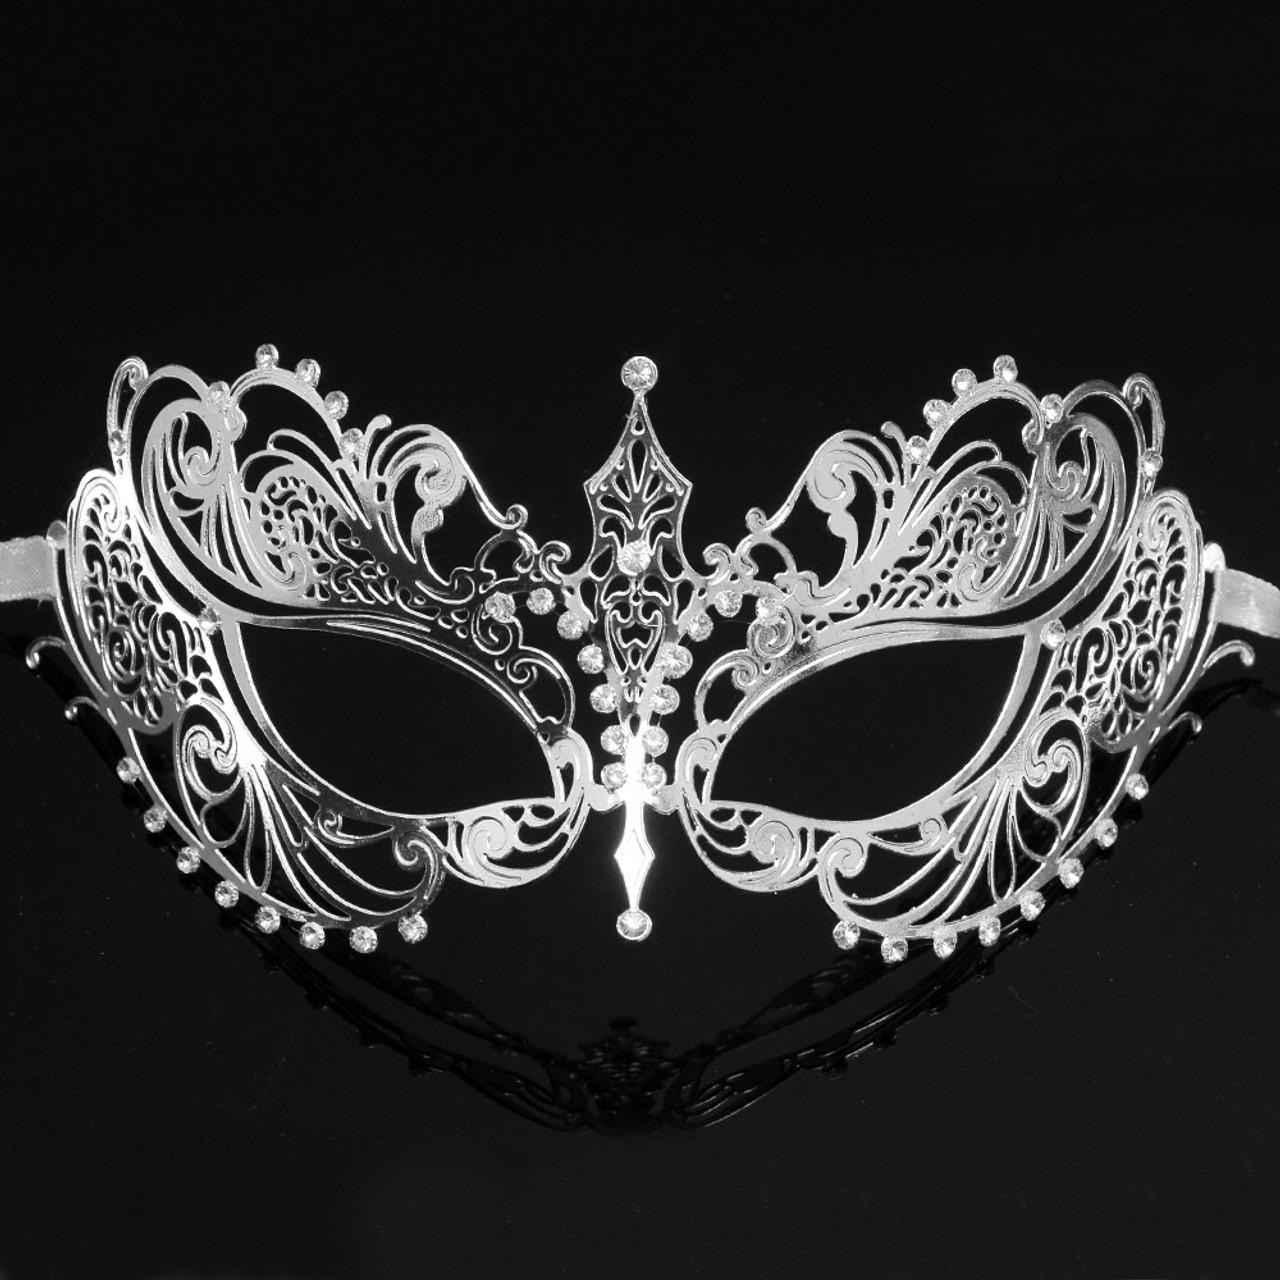 Black With silver masquerade ball masks